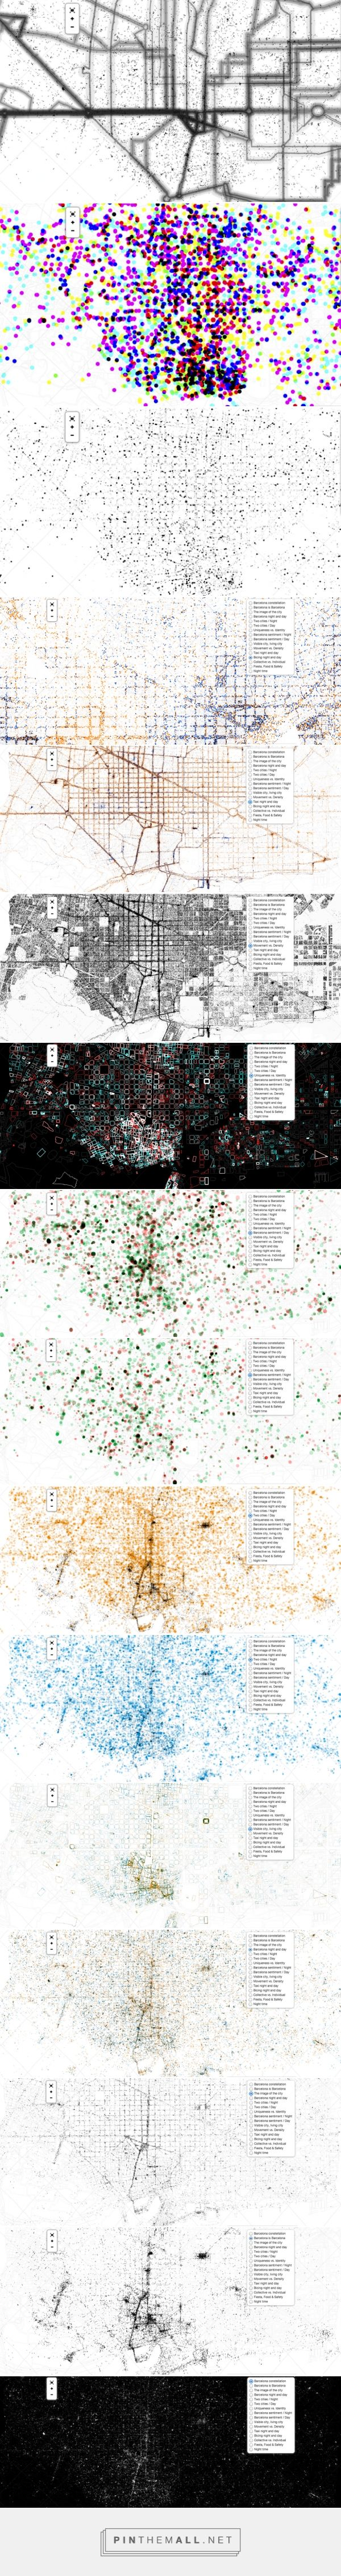 16 Maps That Explain Barcelona via